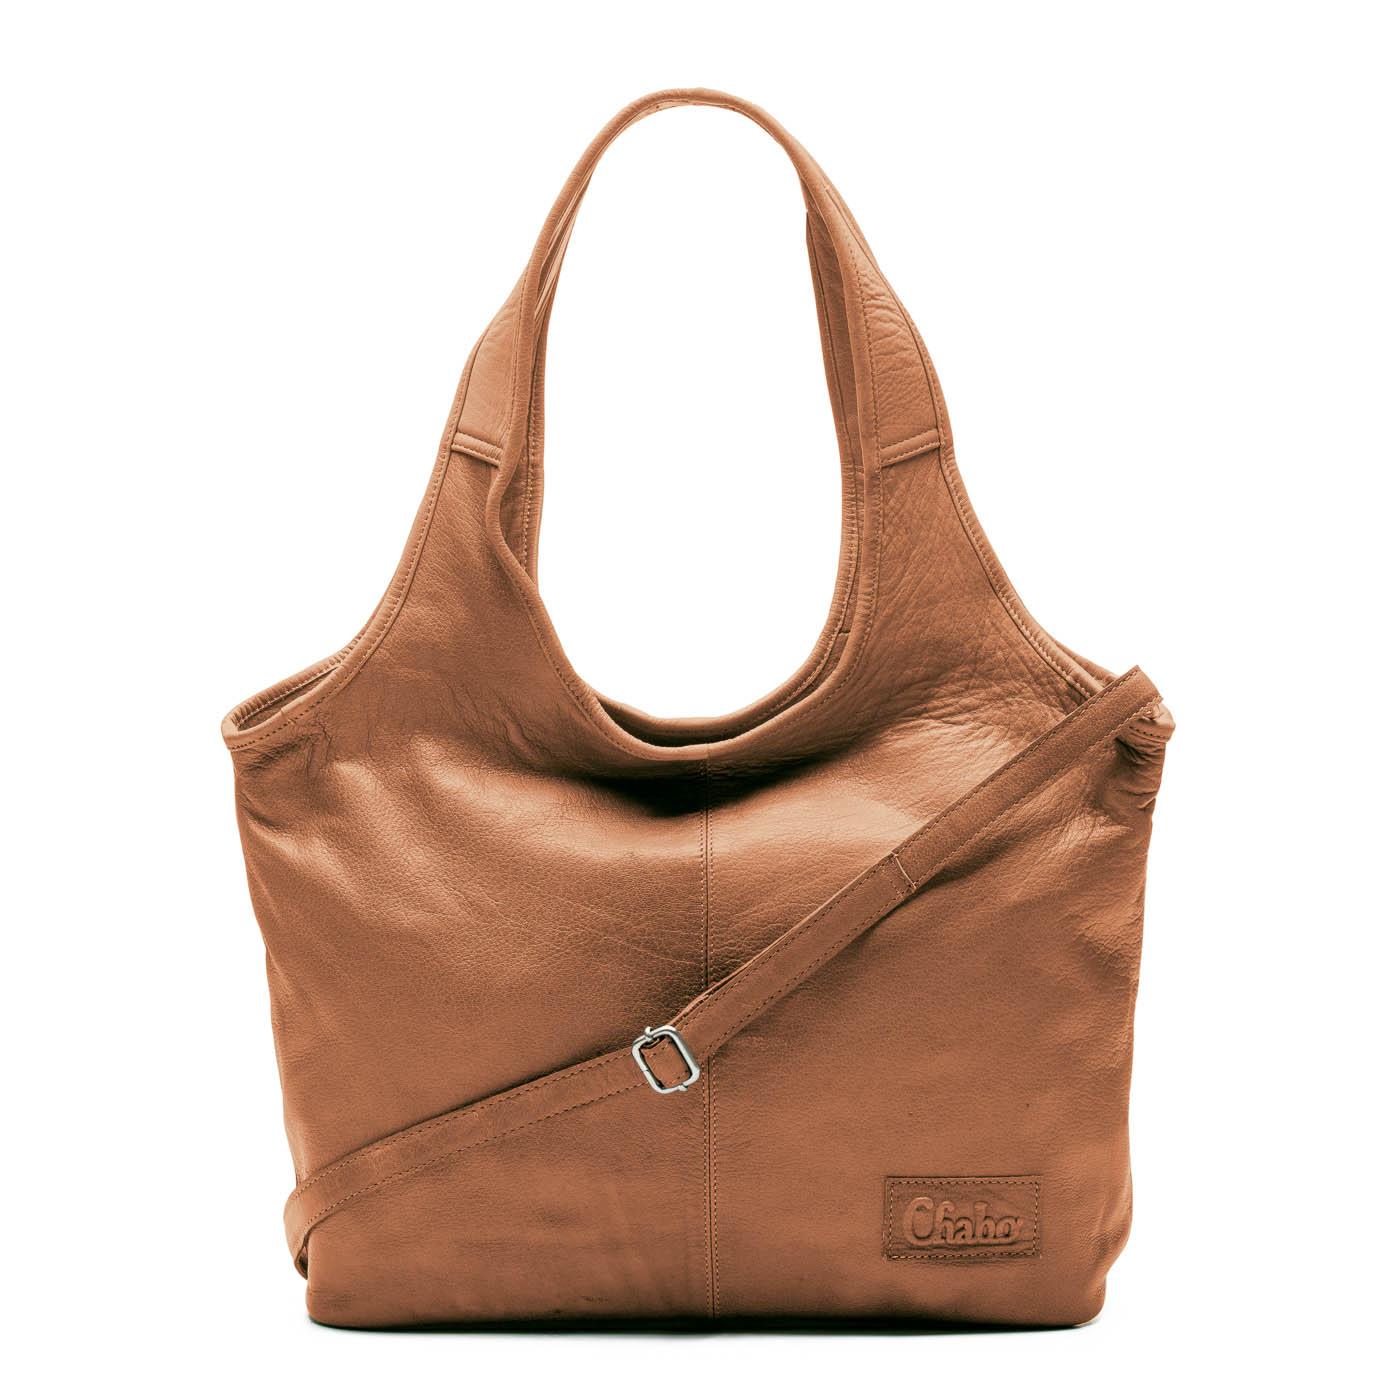 Afbeelding van Chabo Bags Beauty Camel Shopper 8719274534044